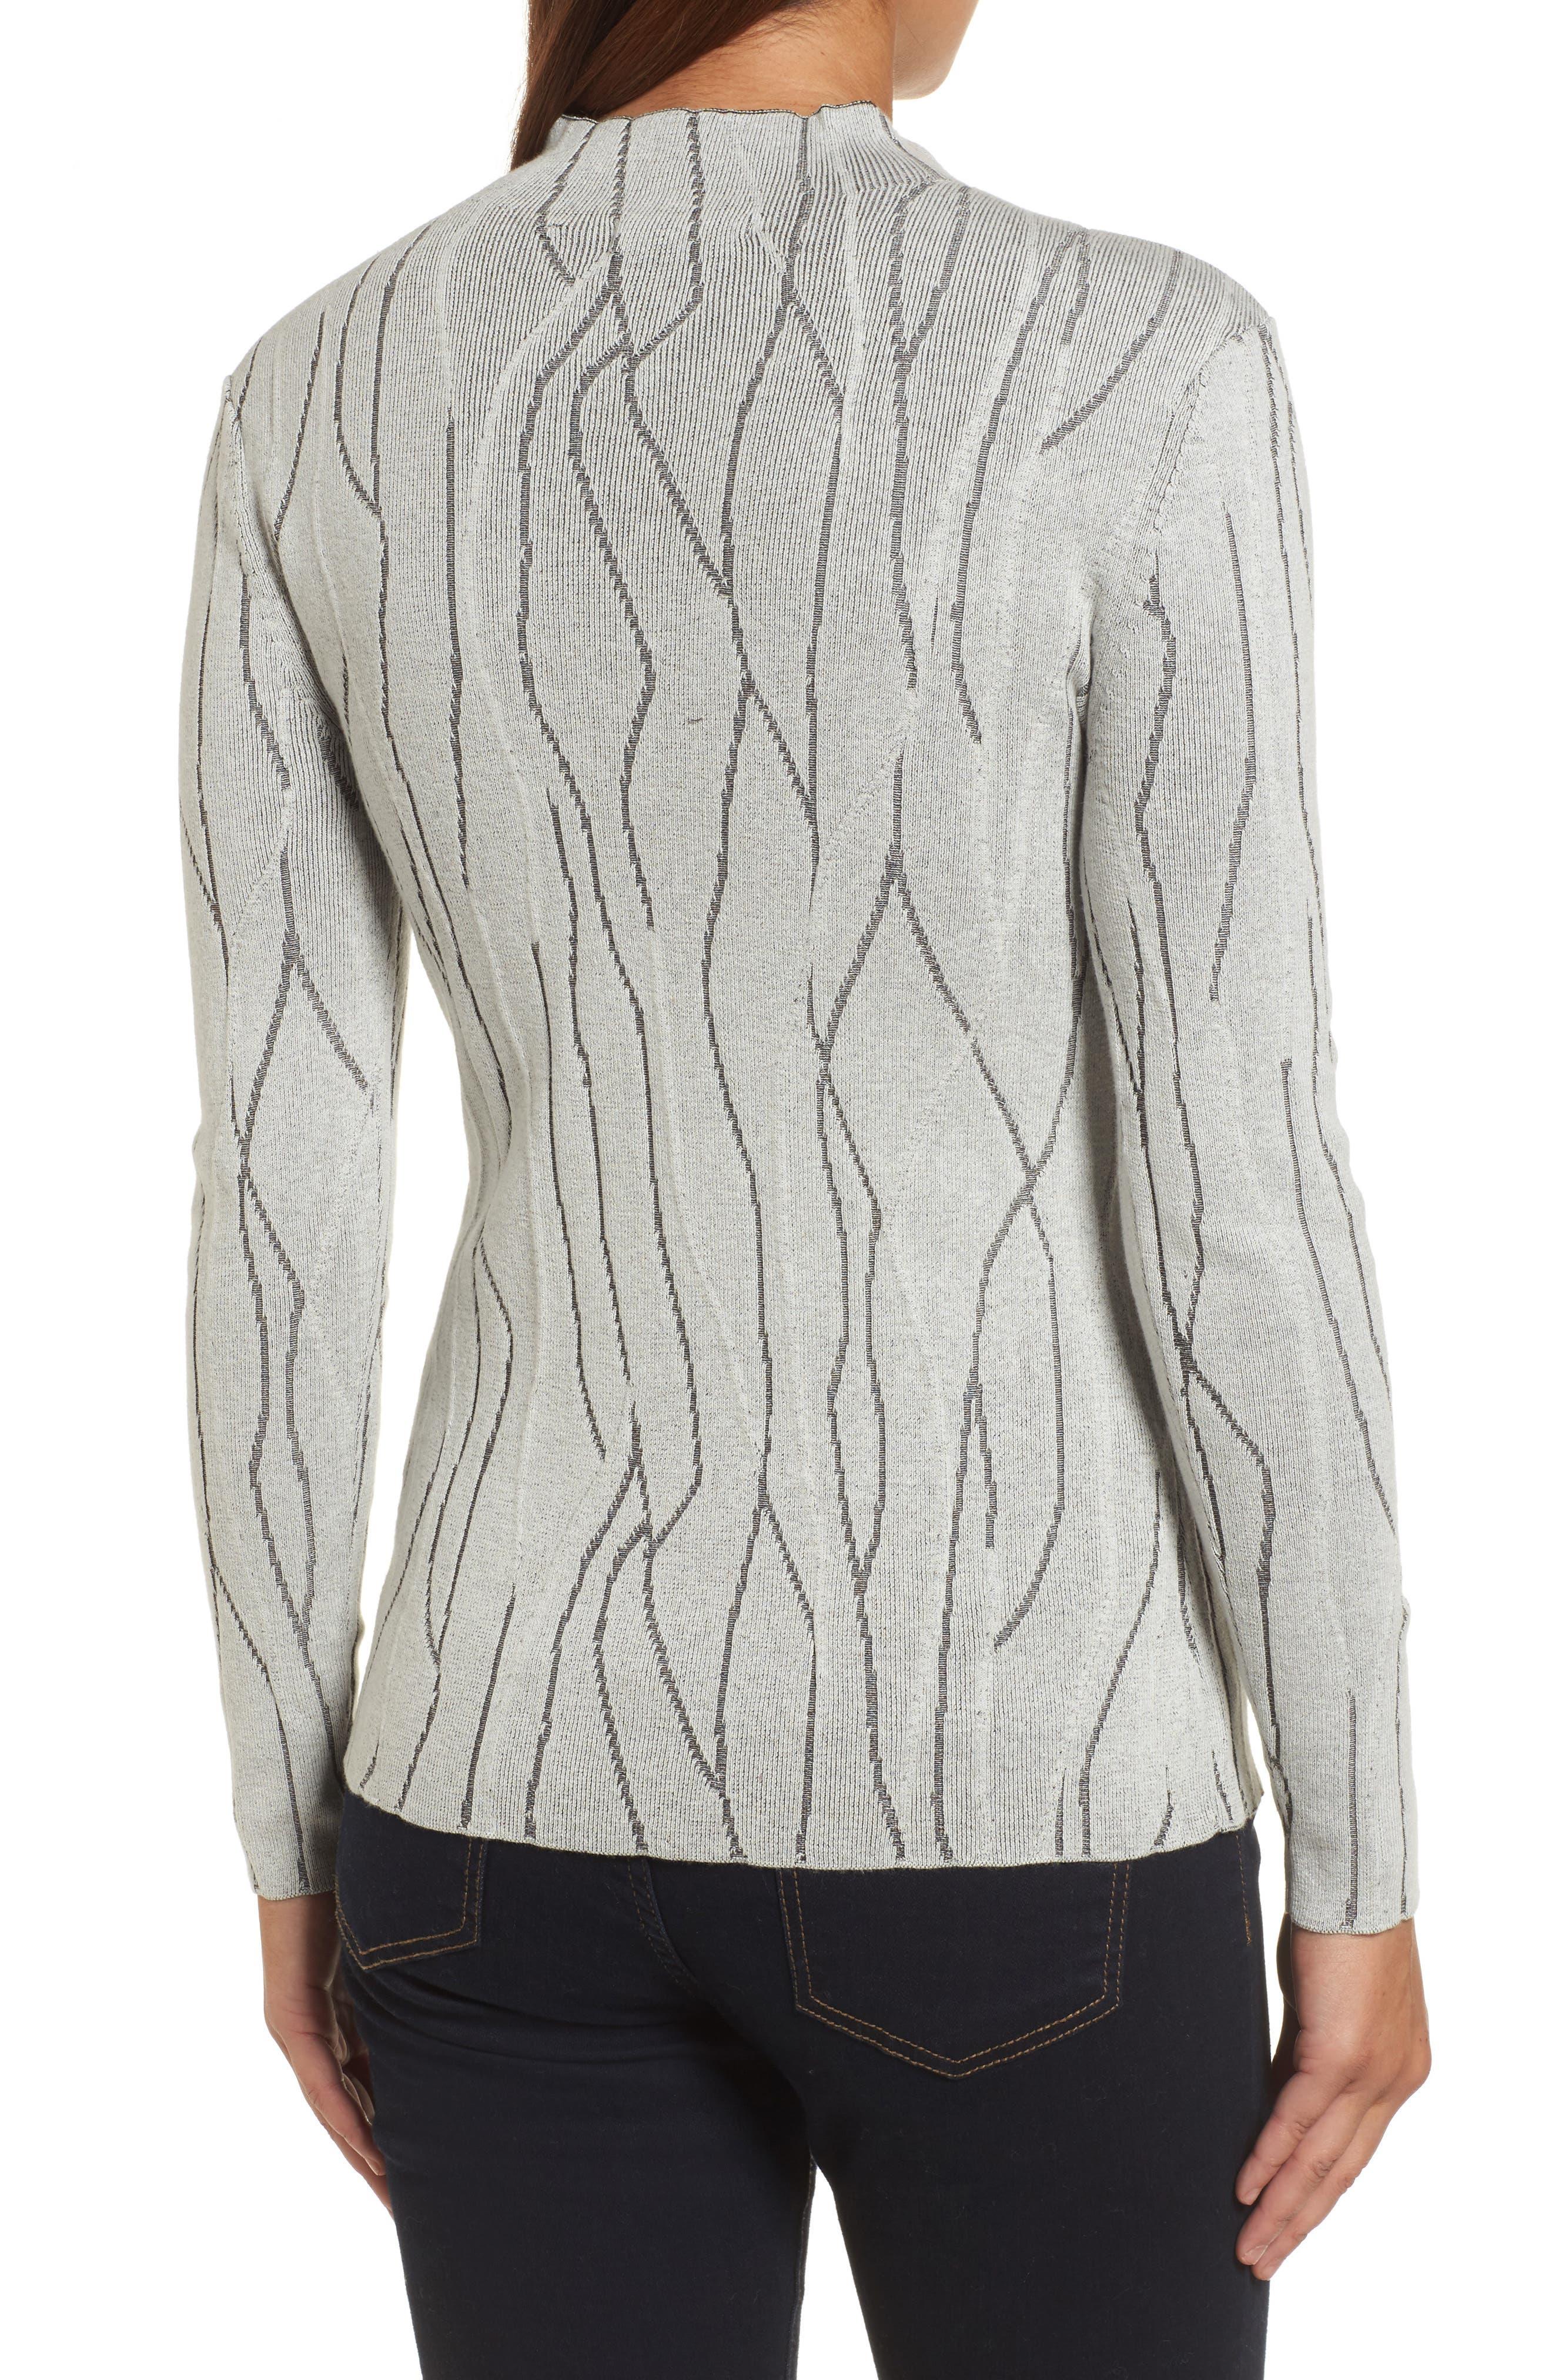 Artisanal Crackle Jacquard Sweater,                             Alternate thumbnail 2, color,                             Chalk